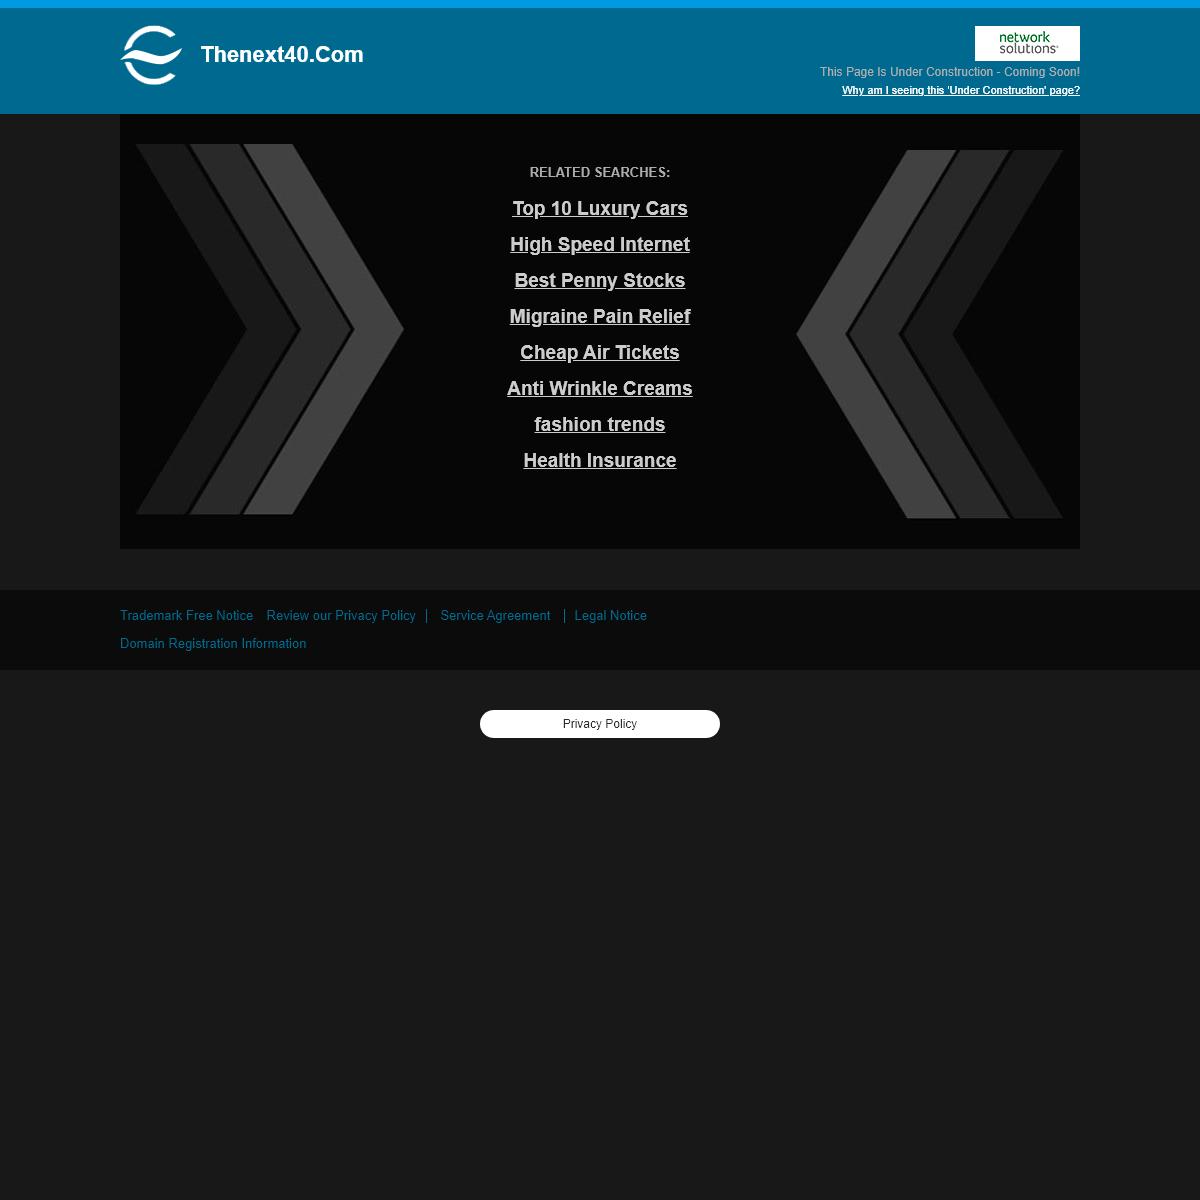 Thenext40.com